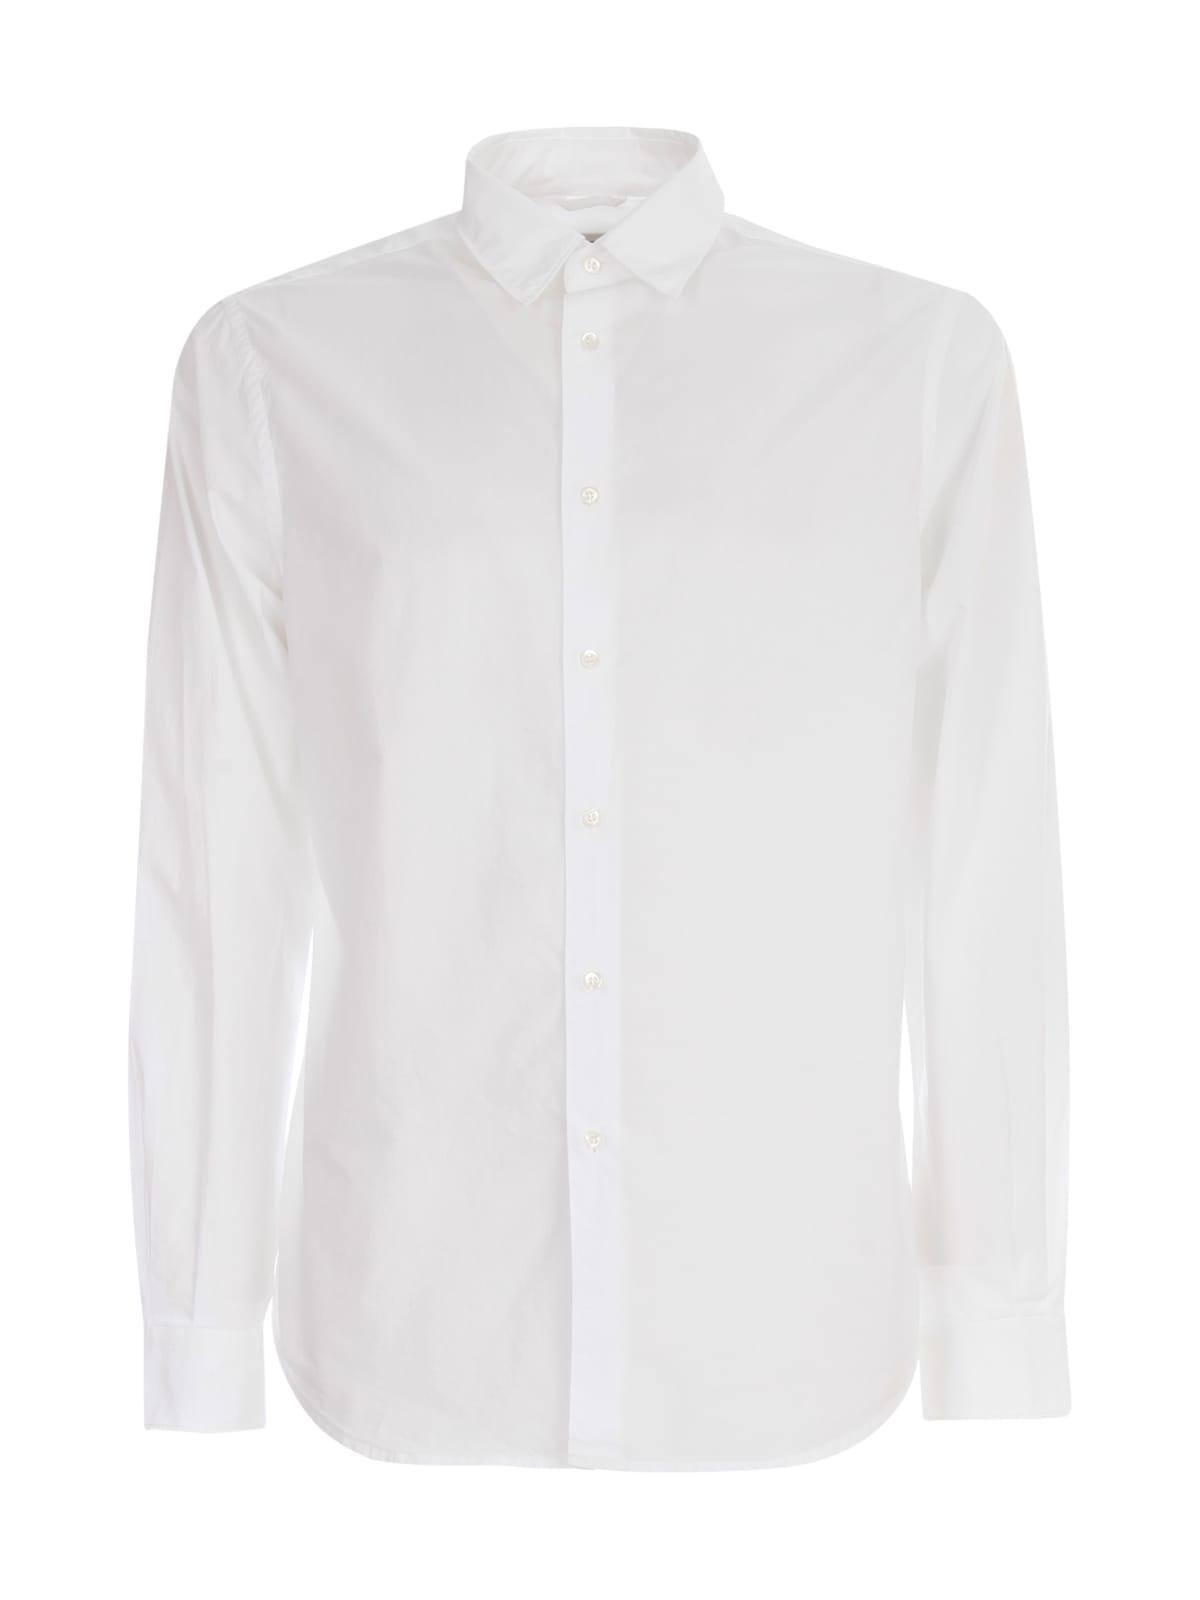 Aspesi Comma Shirt